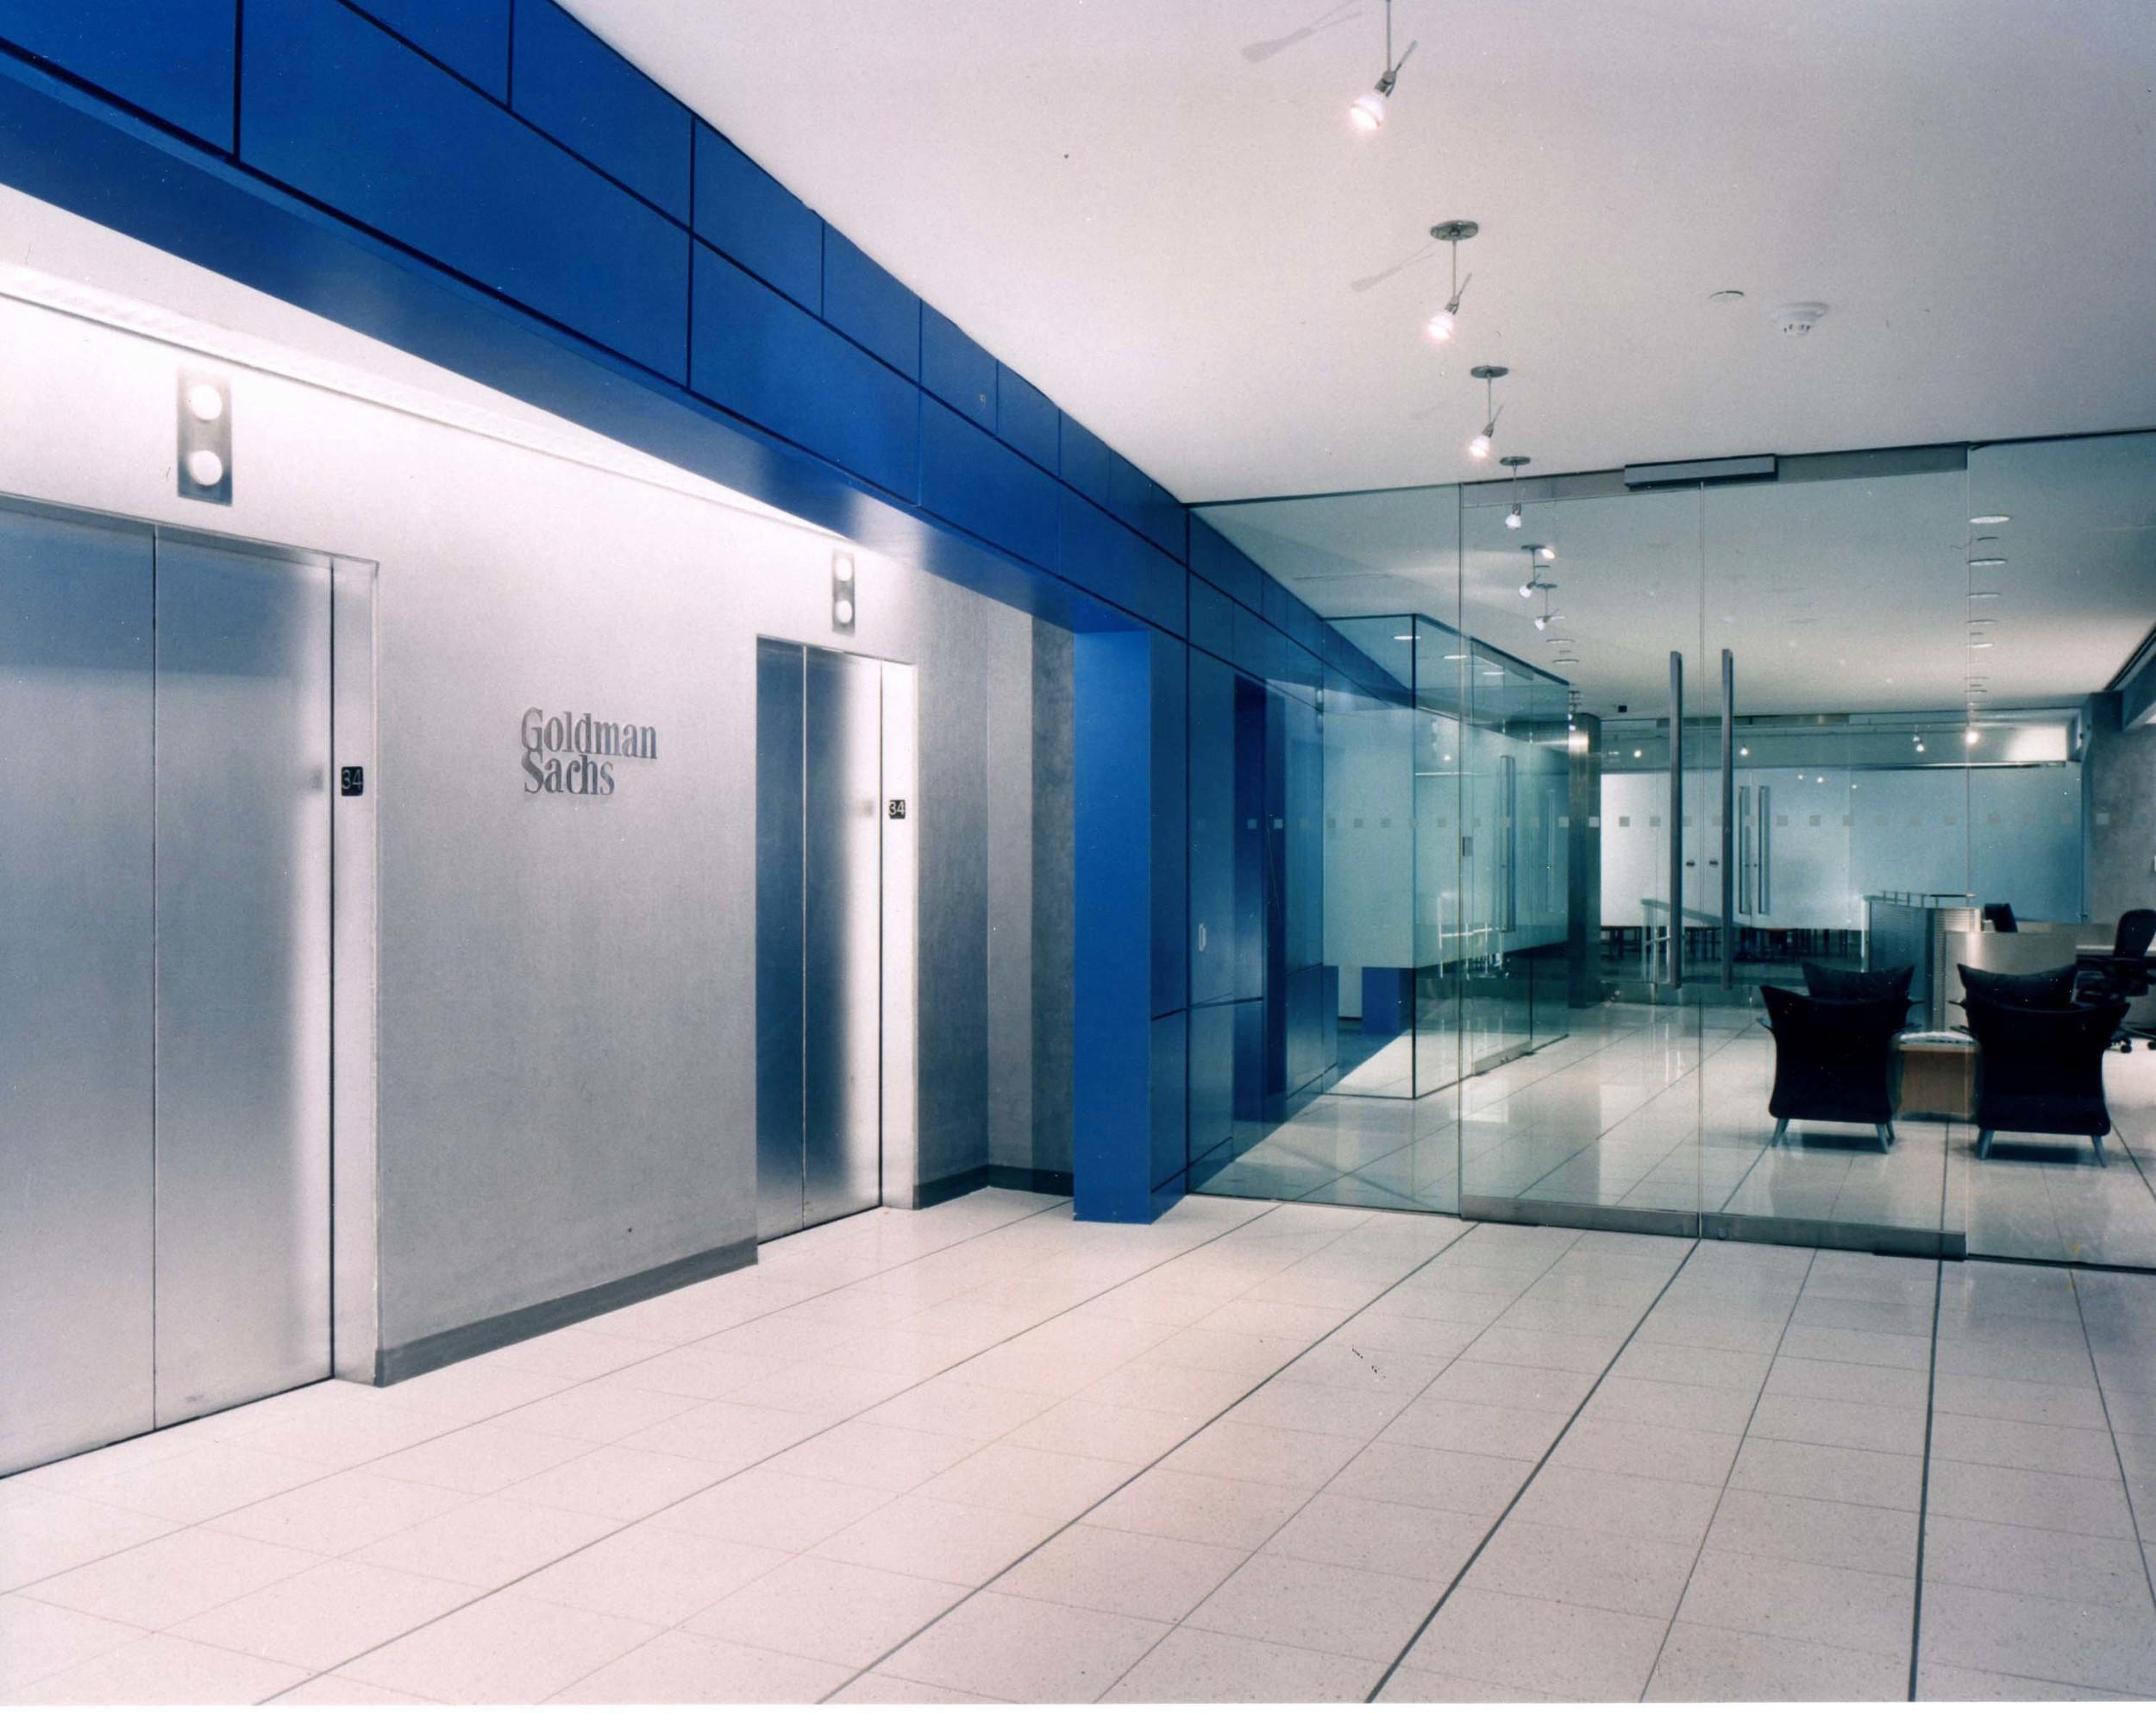 Goldman Sachs - Elevator Lobby.jpg